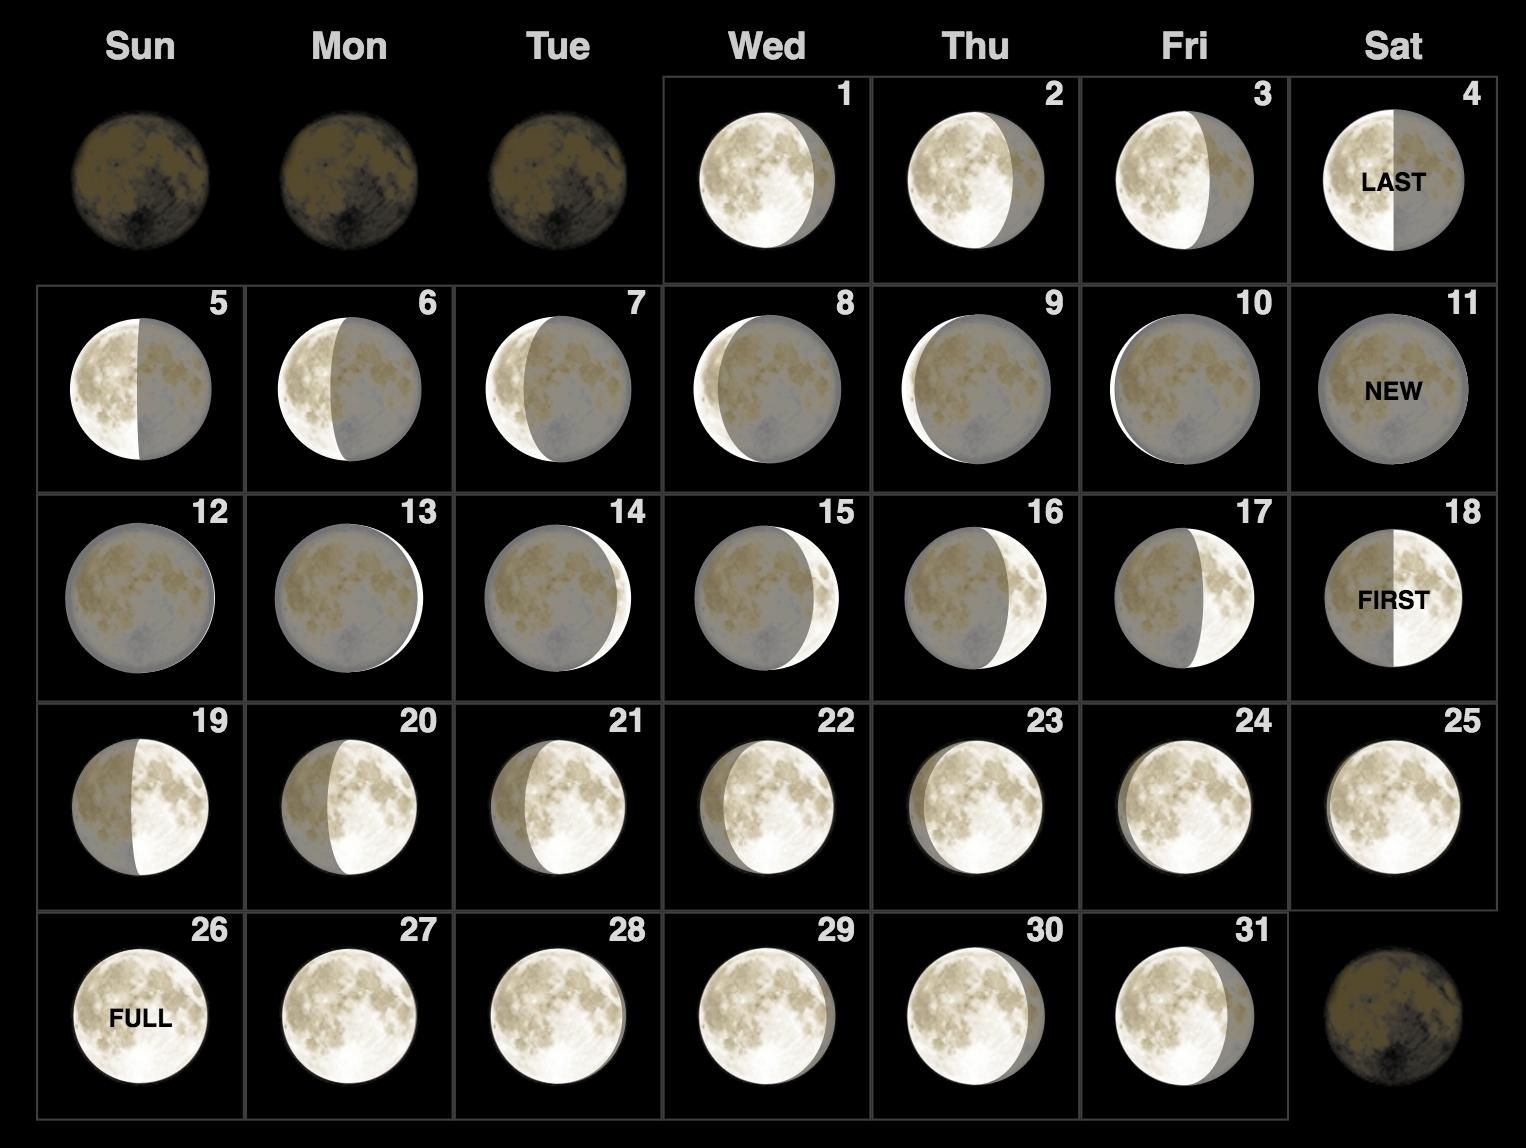 Get June 2019 Full Moon Calendar - Free Calendar And Holidays Calendar 2019 Full Moon